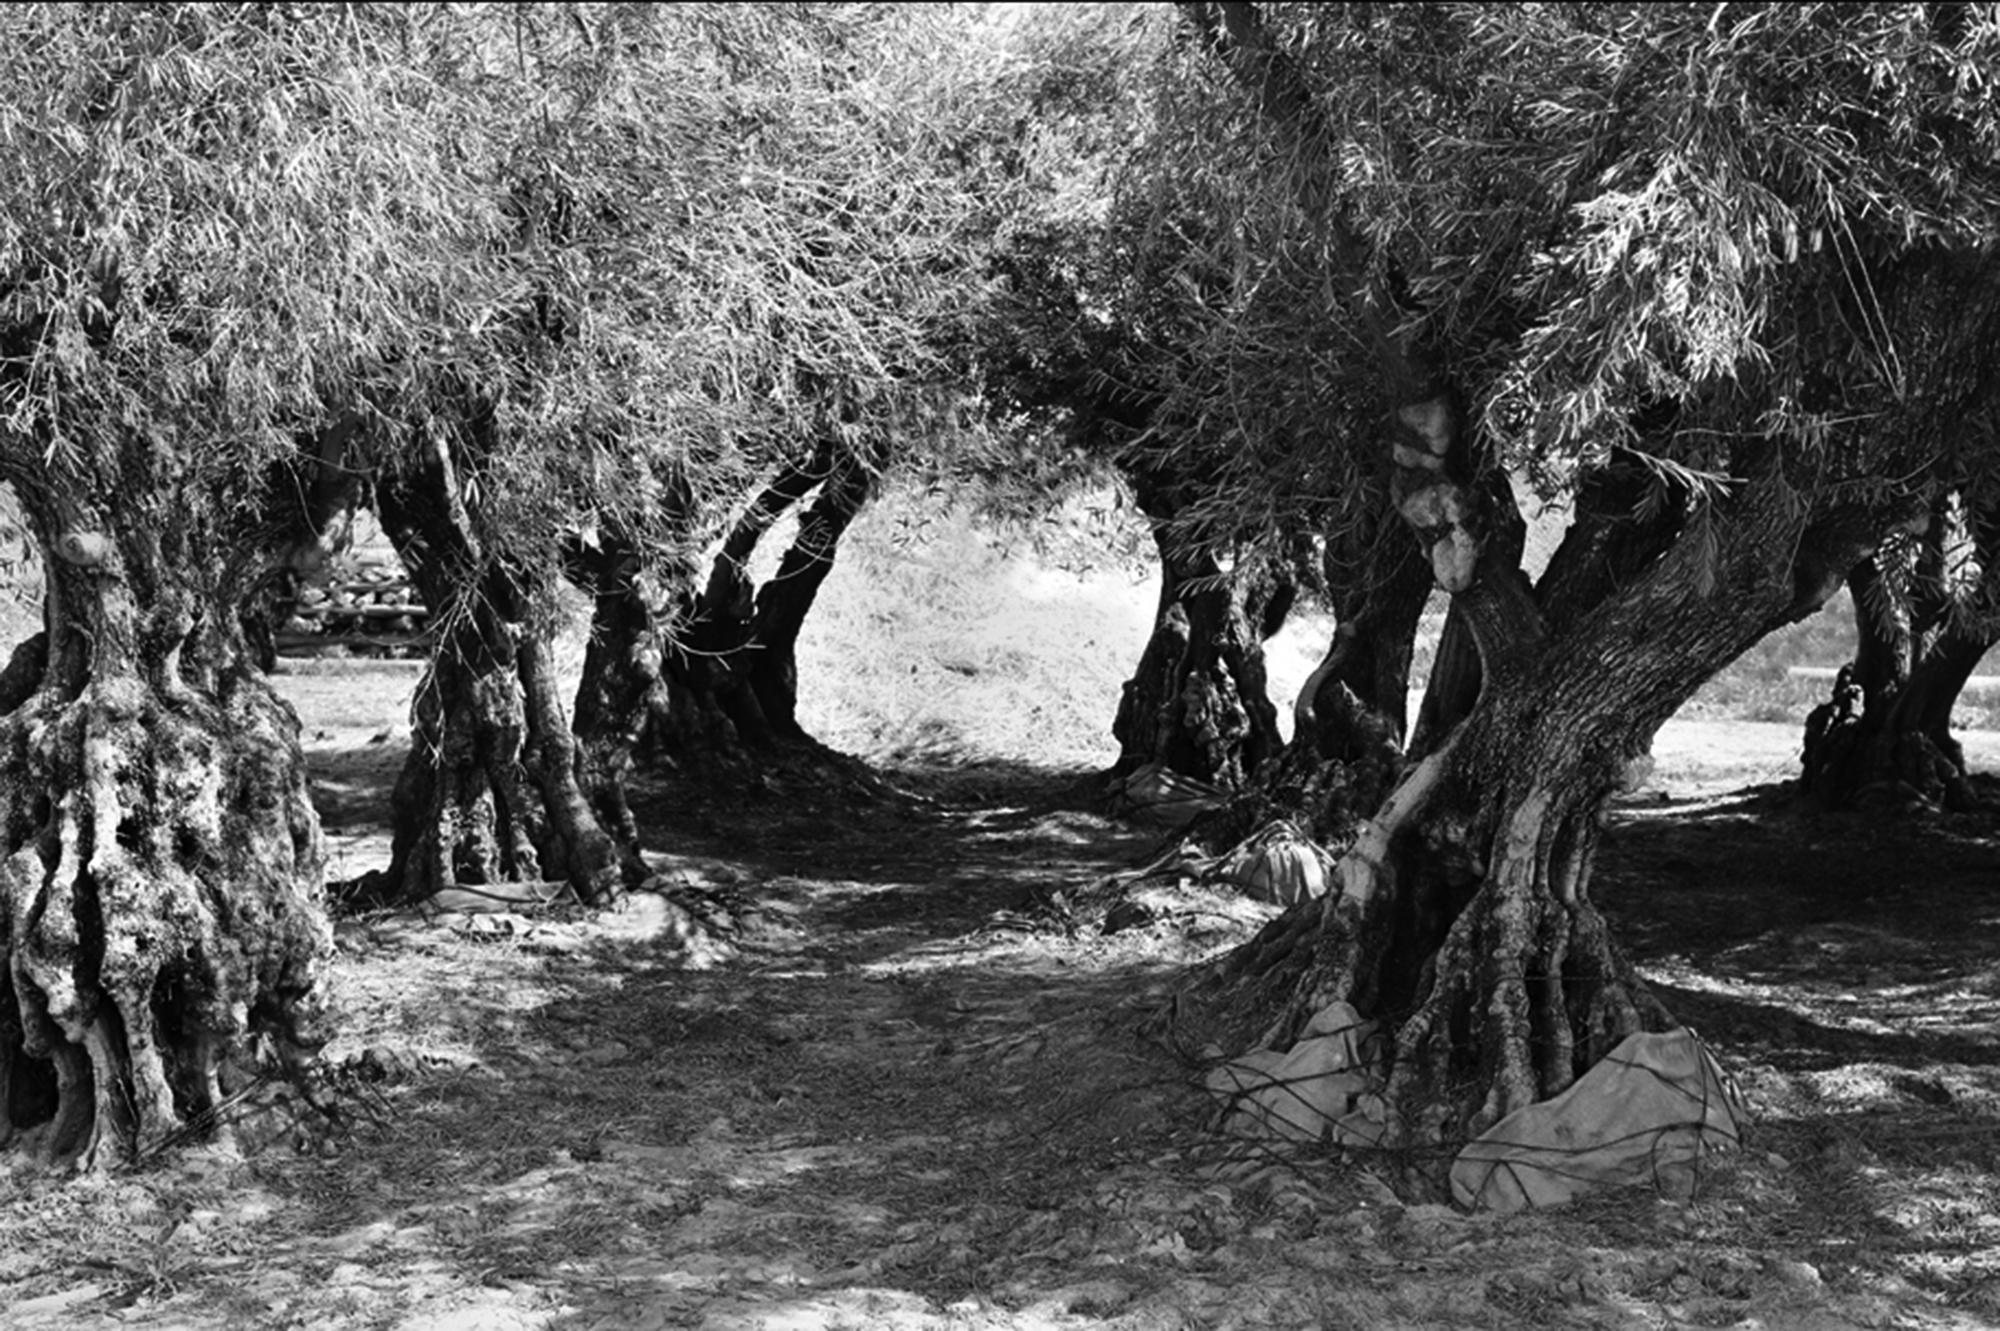 Olivos of Calistoga by Rich J. Velasco